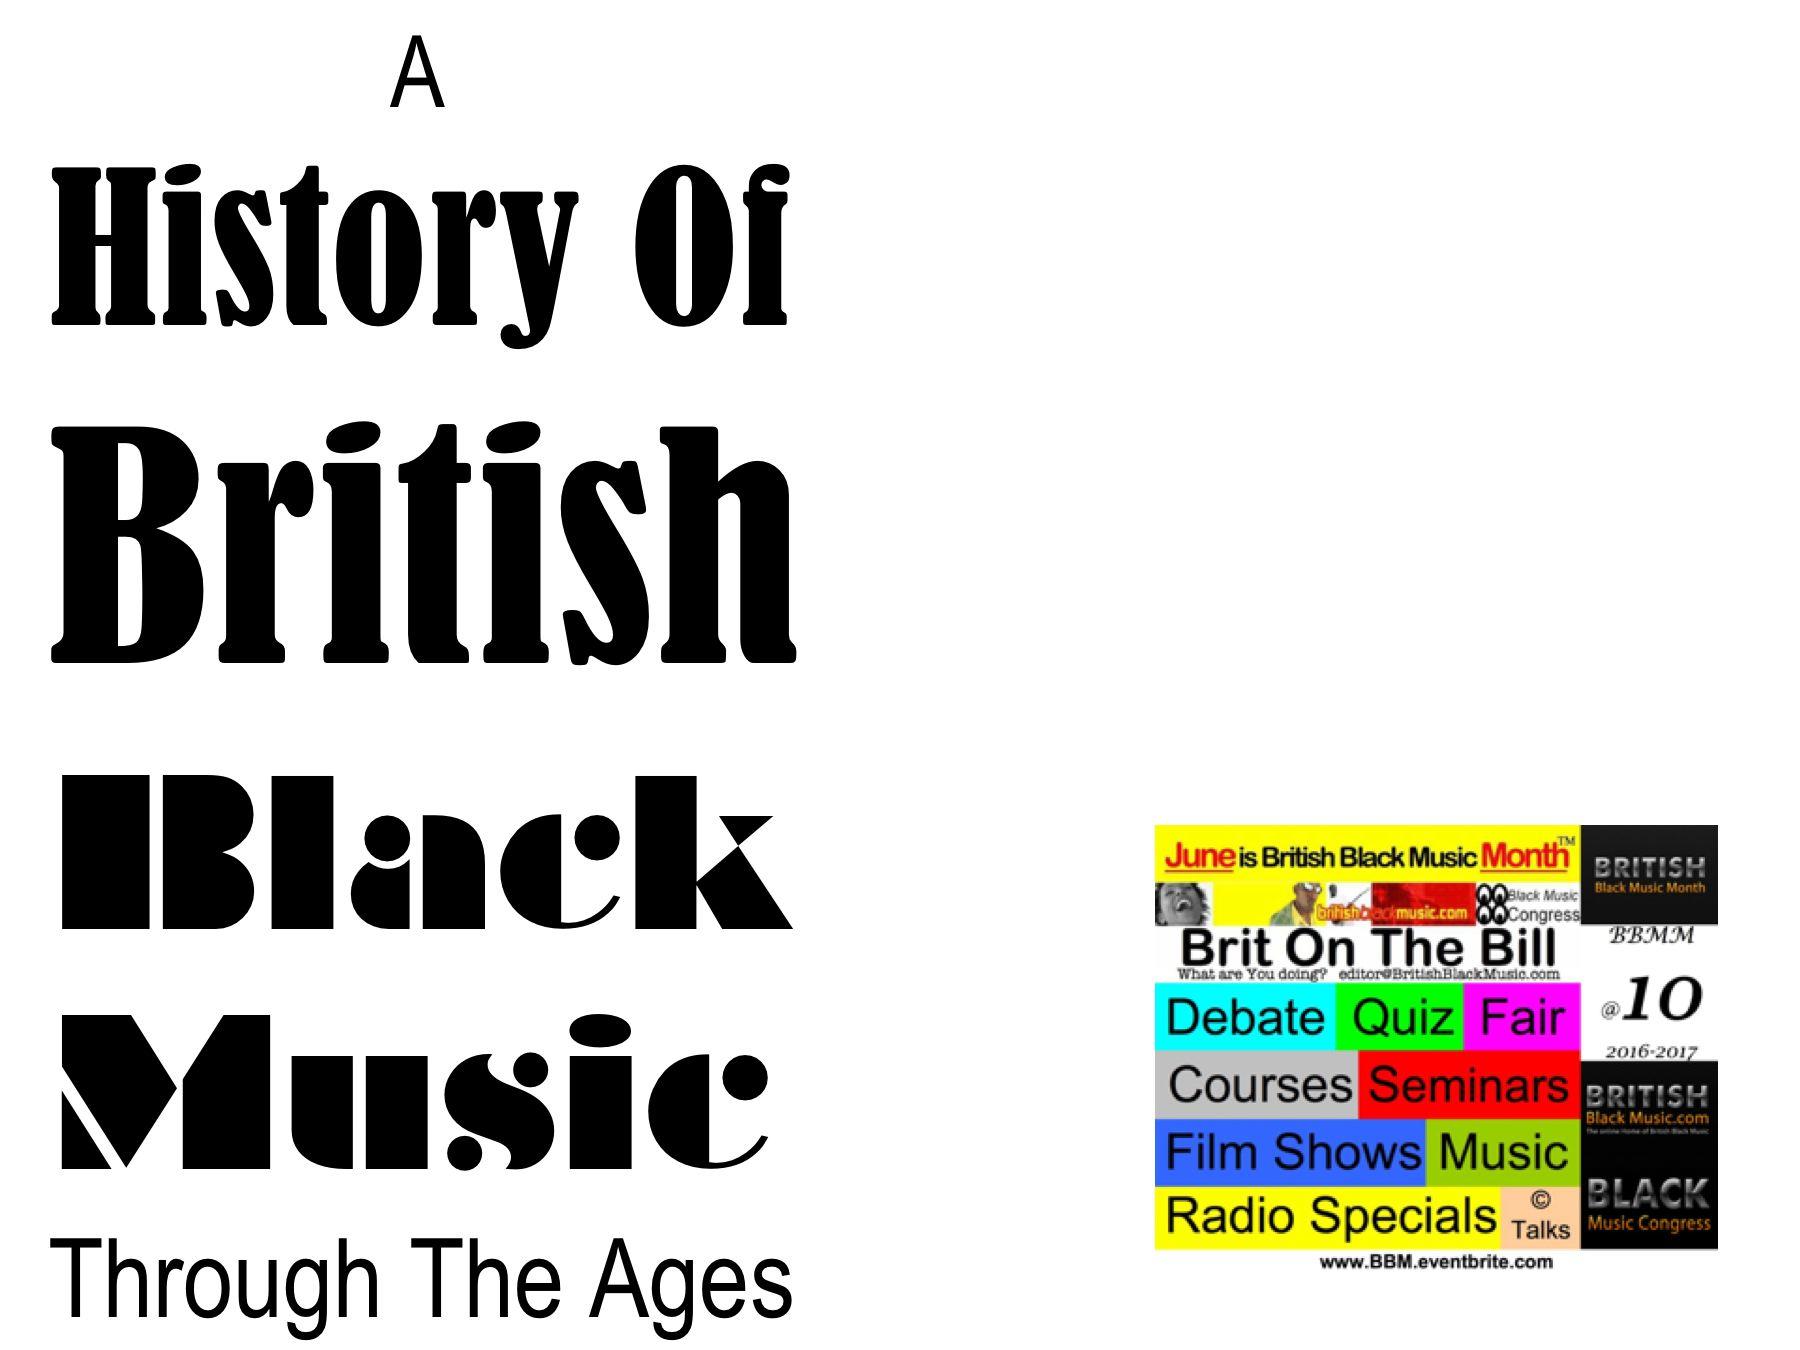 BBM History